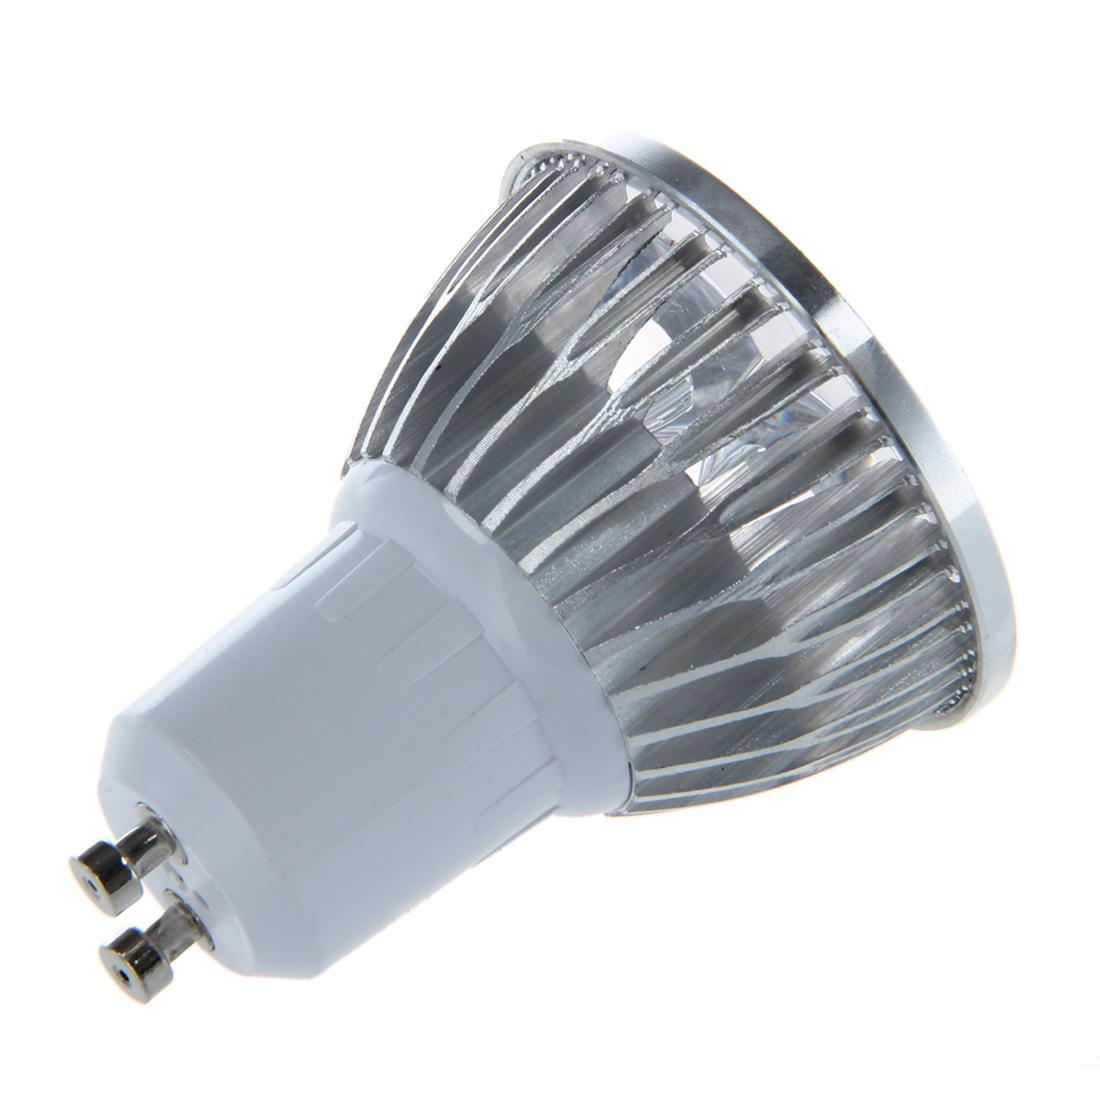 z2g3 10x gu10 warm white 4 leds spotlight light lamp bulb 4w energy saving z2g3 ebay. Black Bedroom Furniture Sets. Home Design Ideas